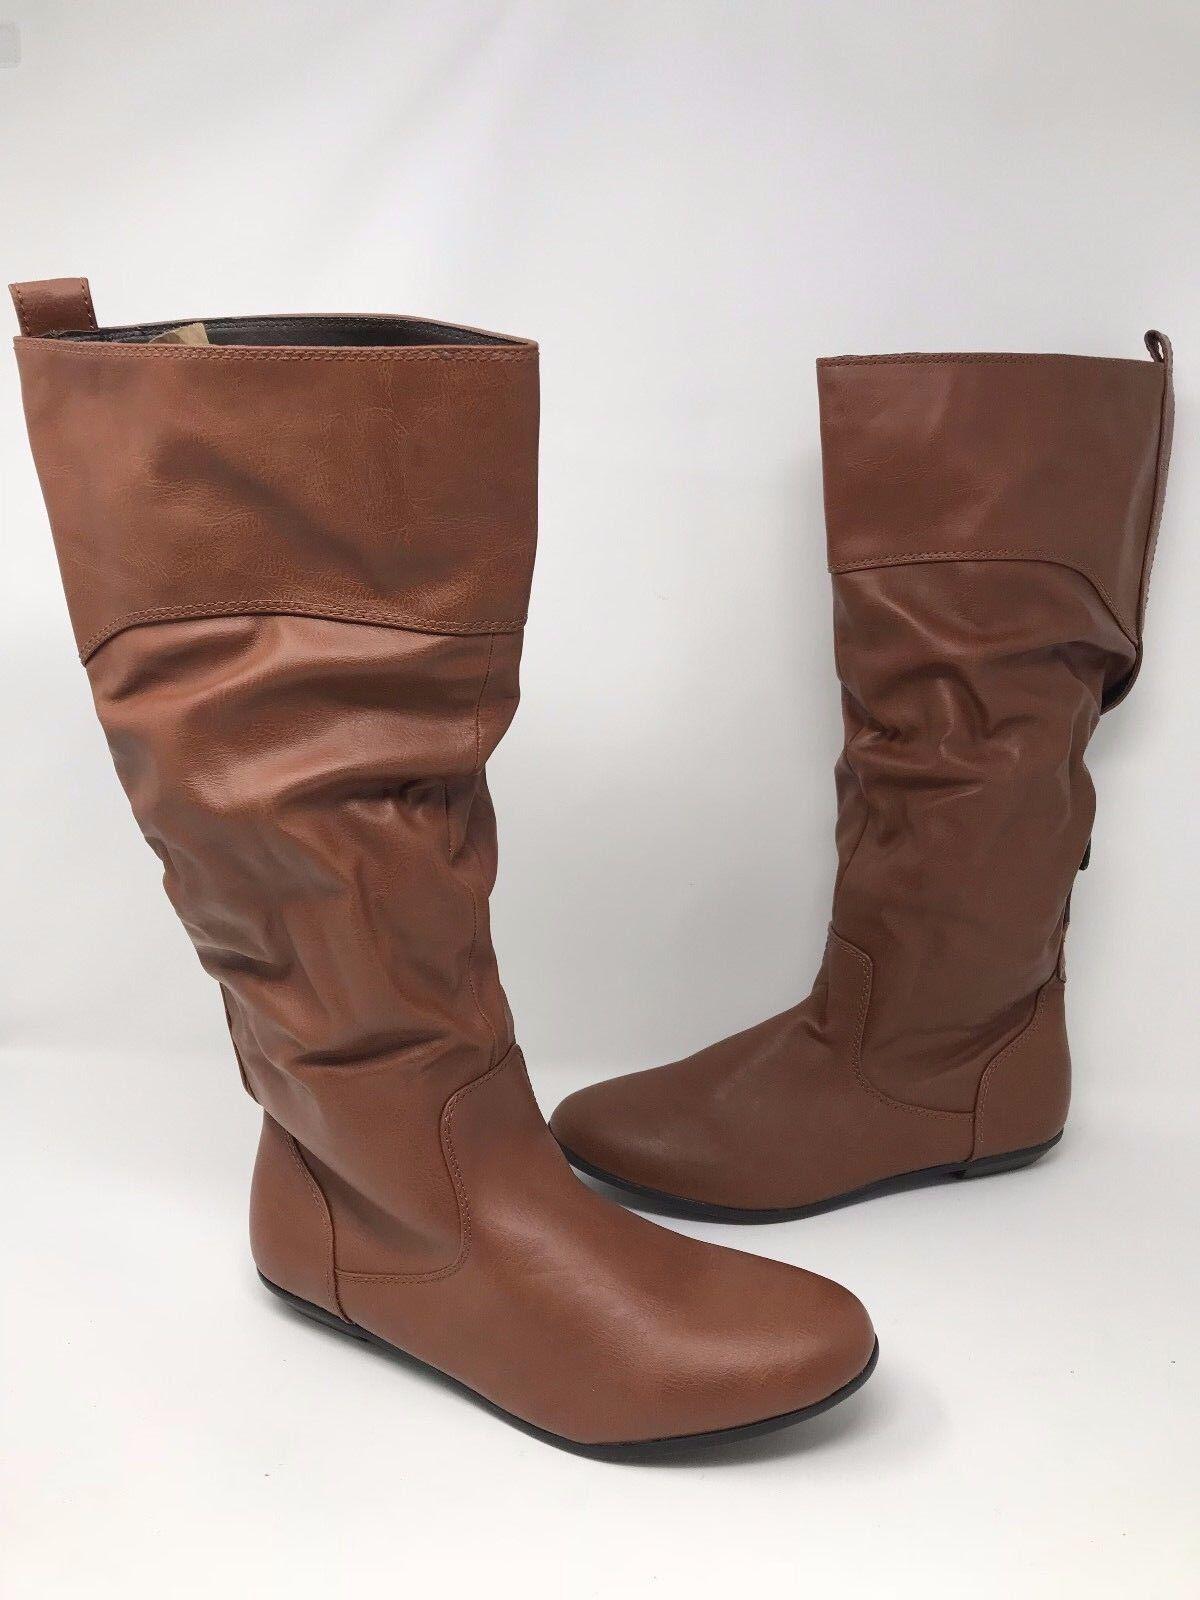 New! Womens Bongo Logan 20303 Slouch Riding Boots - WIDE WIDTH Cognac O55